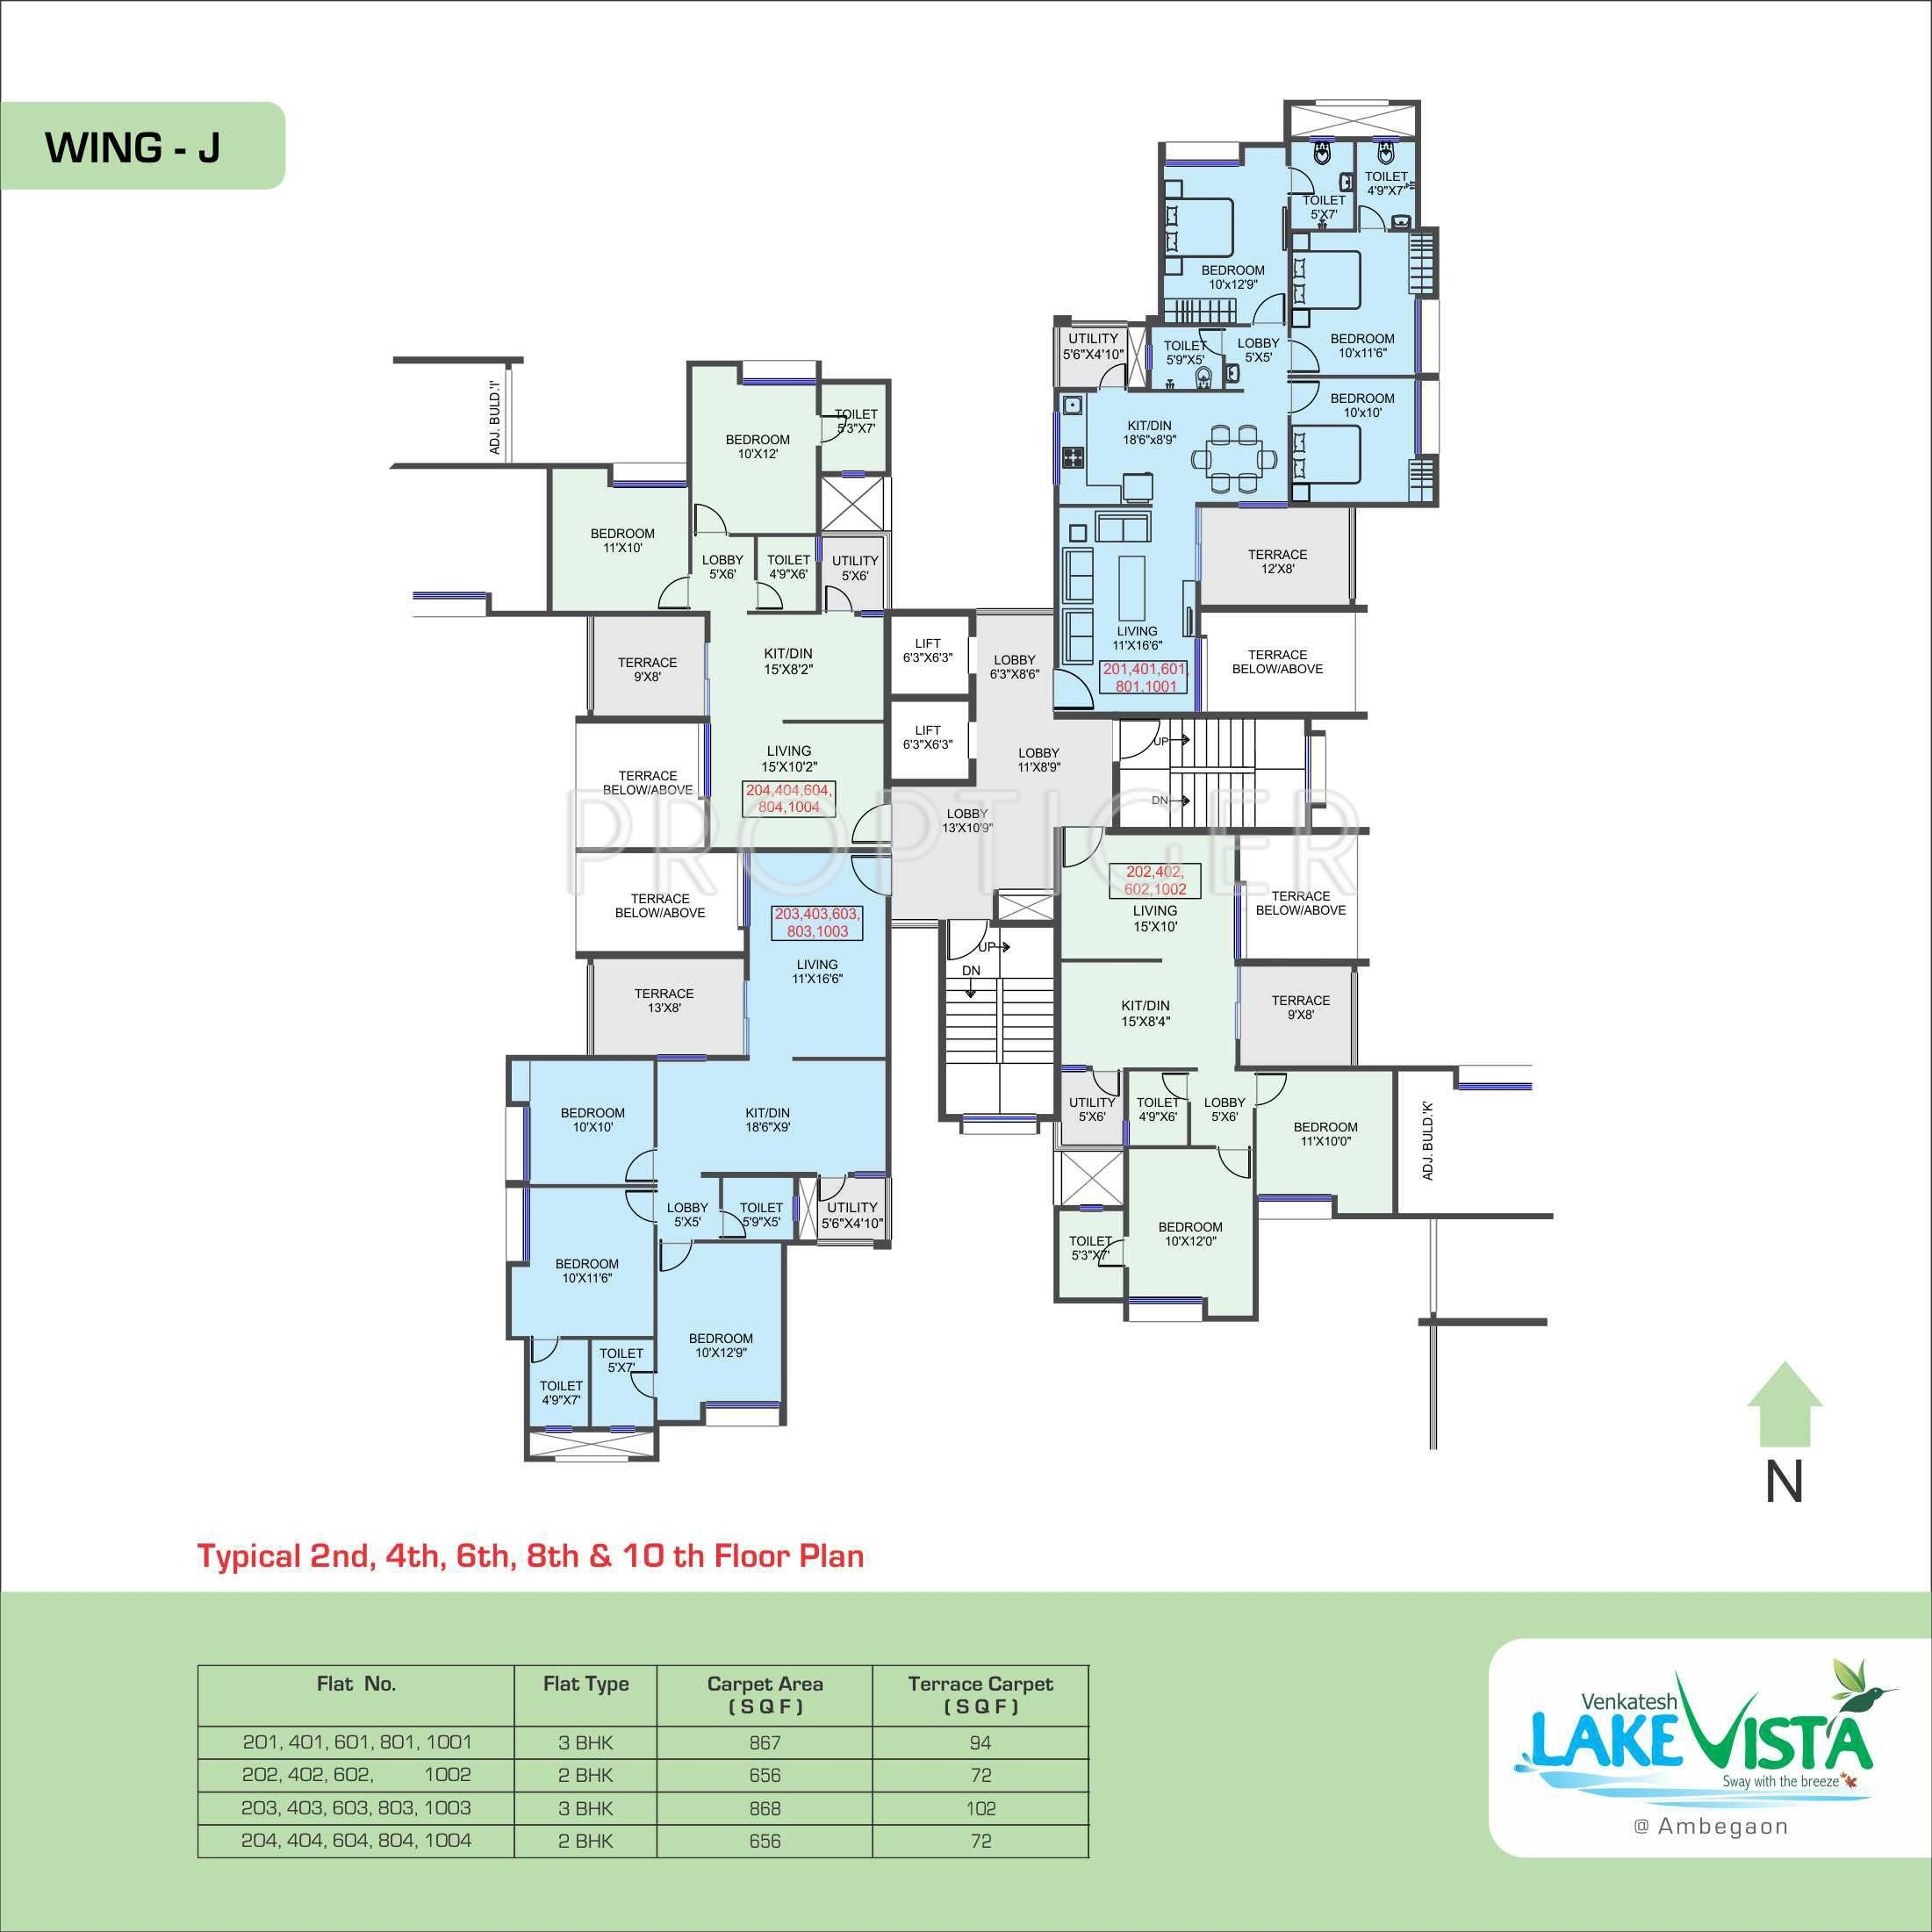 957 Sq Ft 2 BHK 2T Apartment For Sale In Shree Venkatesh